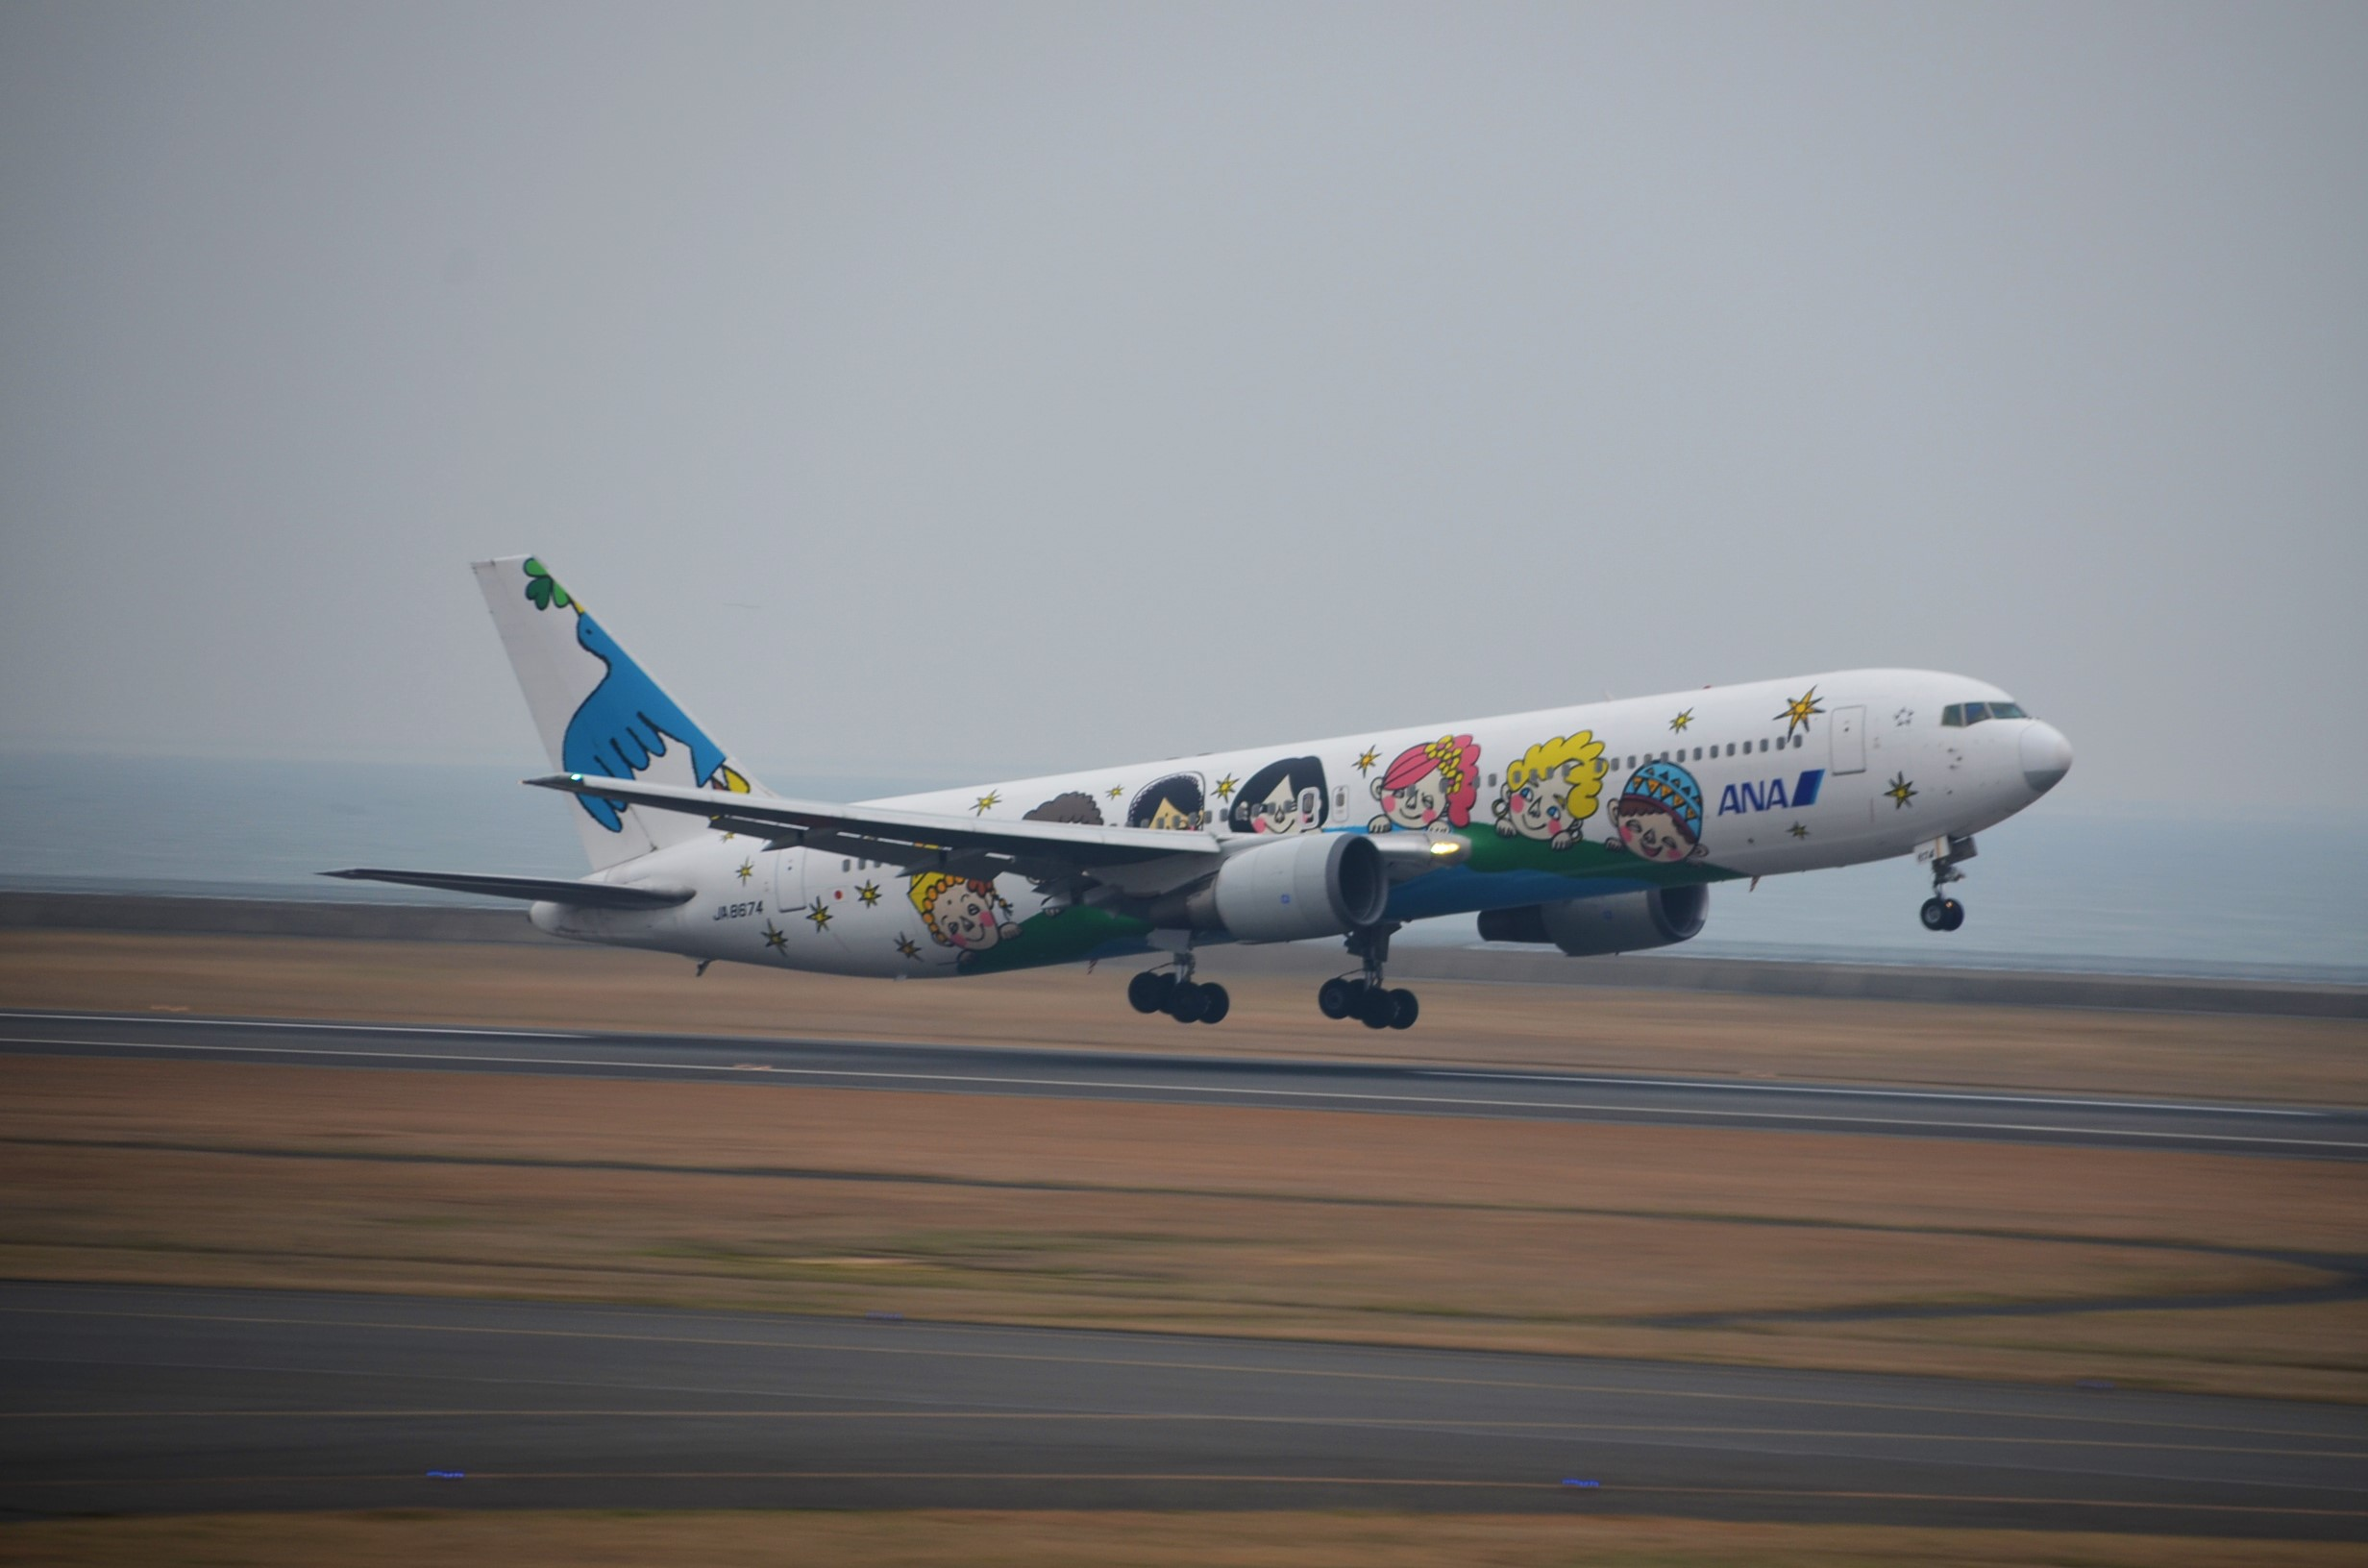 """Tokiwa ParkからUBE Airport・・・そして旅立ち\""_d0153941_22461566.jpg"